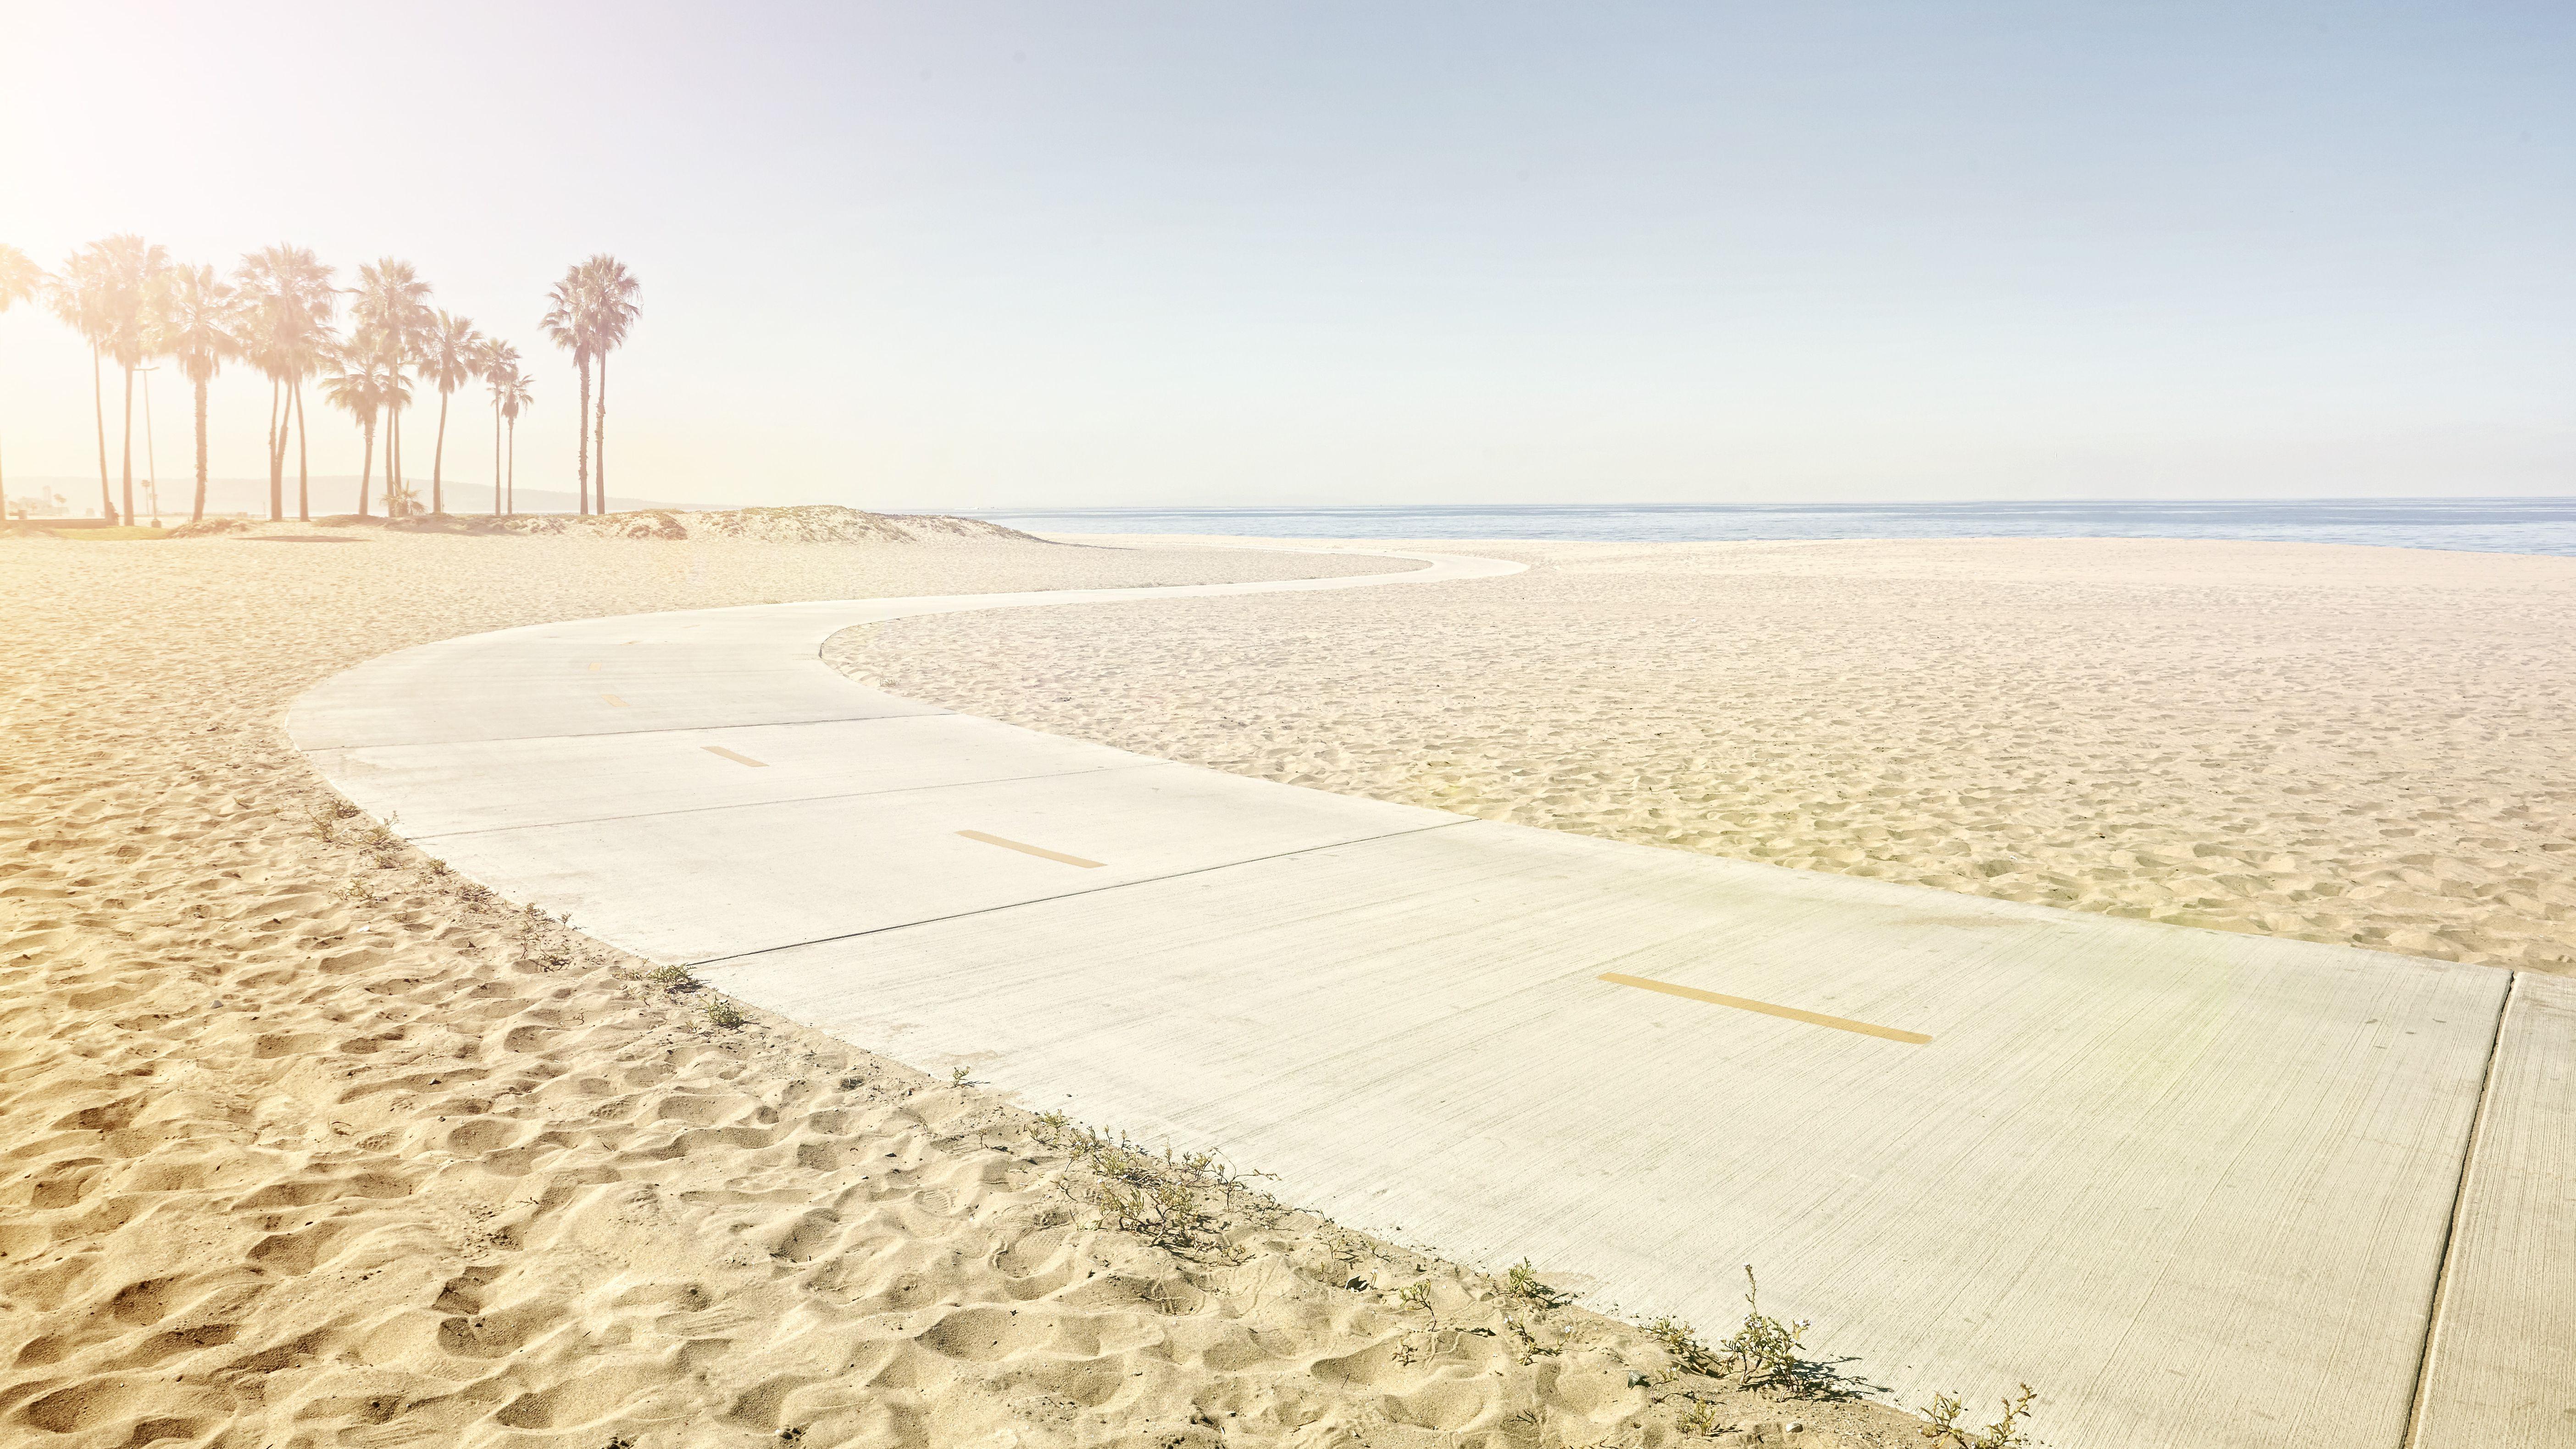 University Of San Diego Academic Calendar.2020 Spring Break Dates For California Colleges And Universities